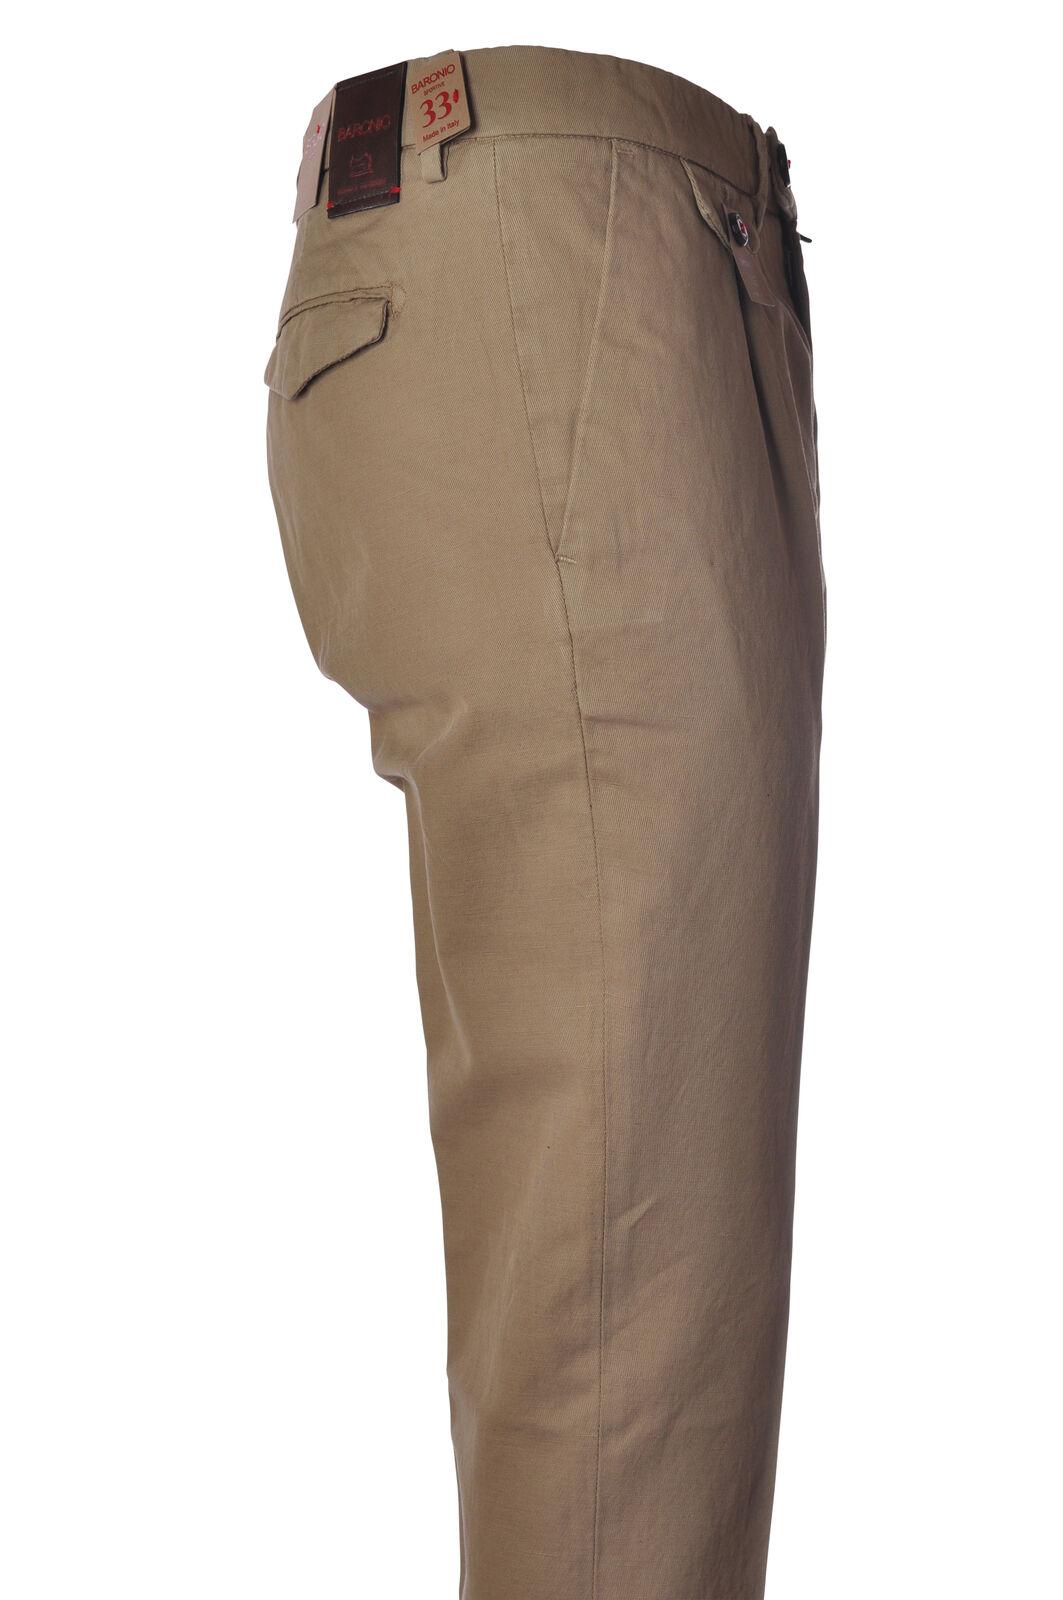 Baronio - Pants-Pants - Man - Beige - 5313920F180810